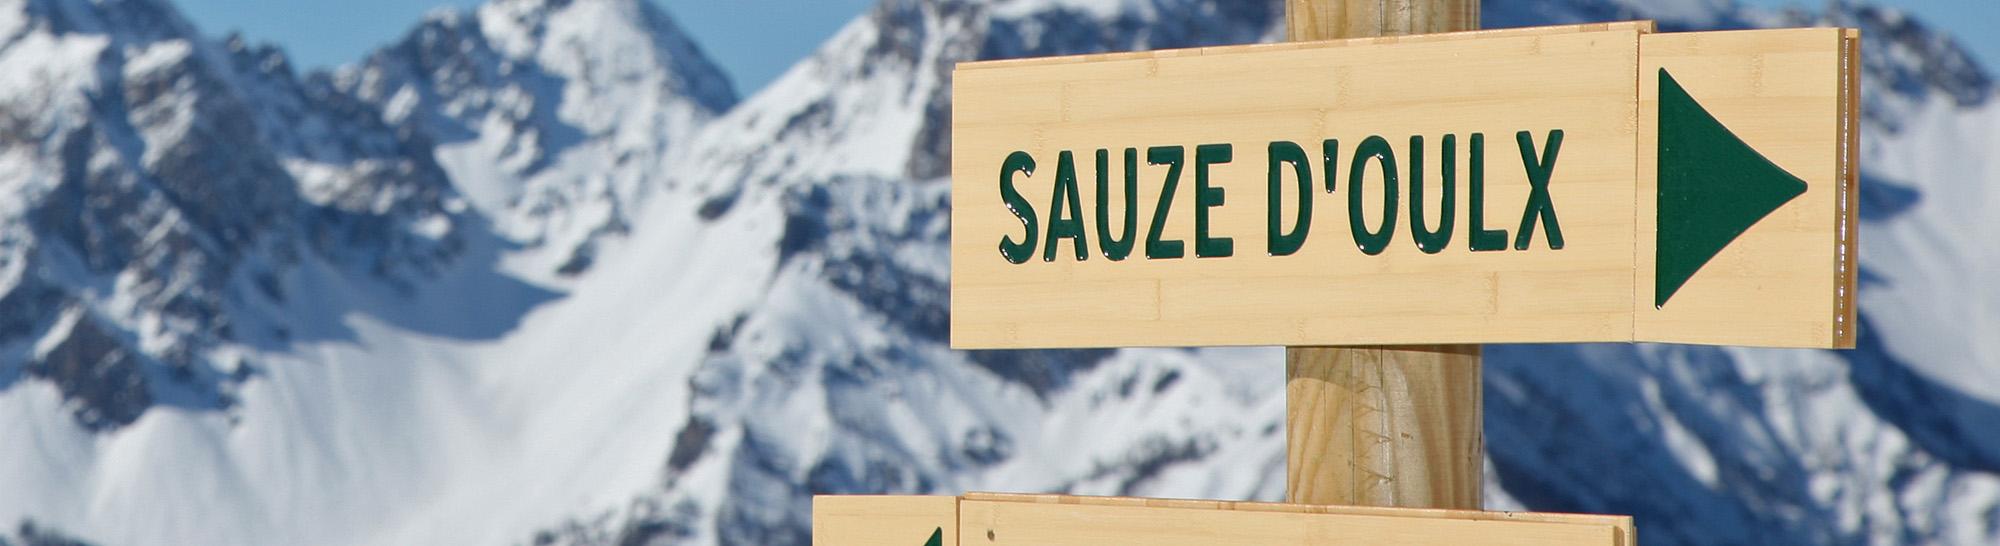 directions fir Sauze d'Oulx